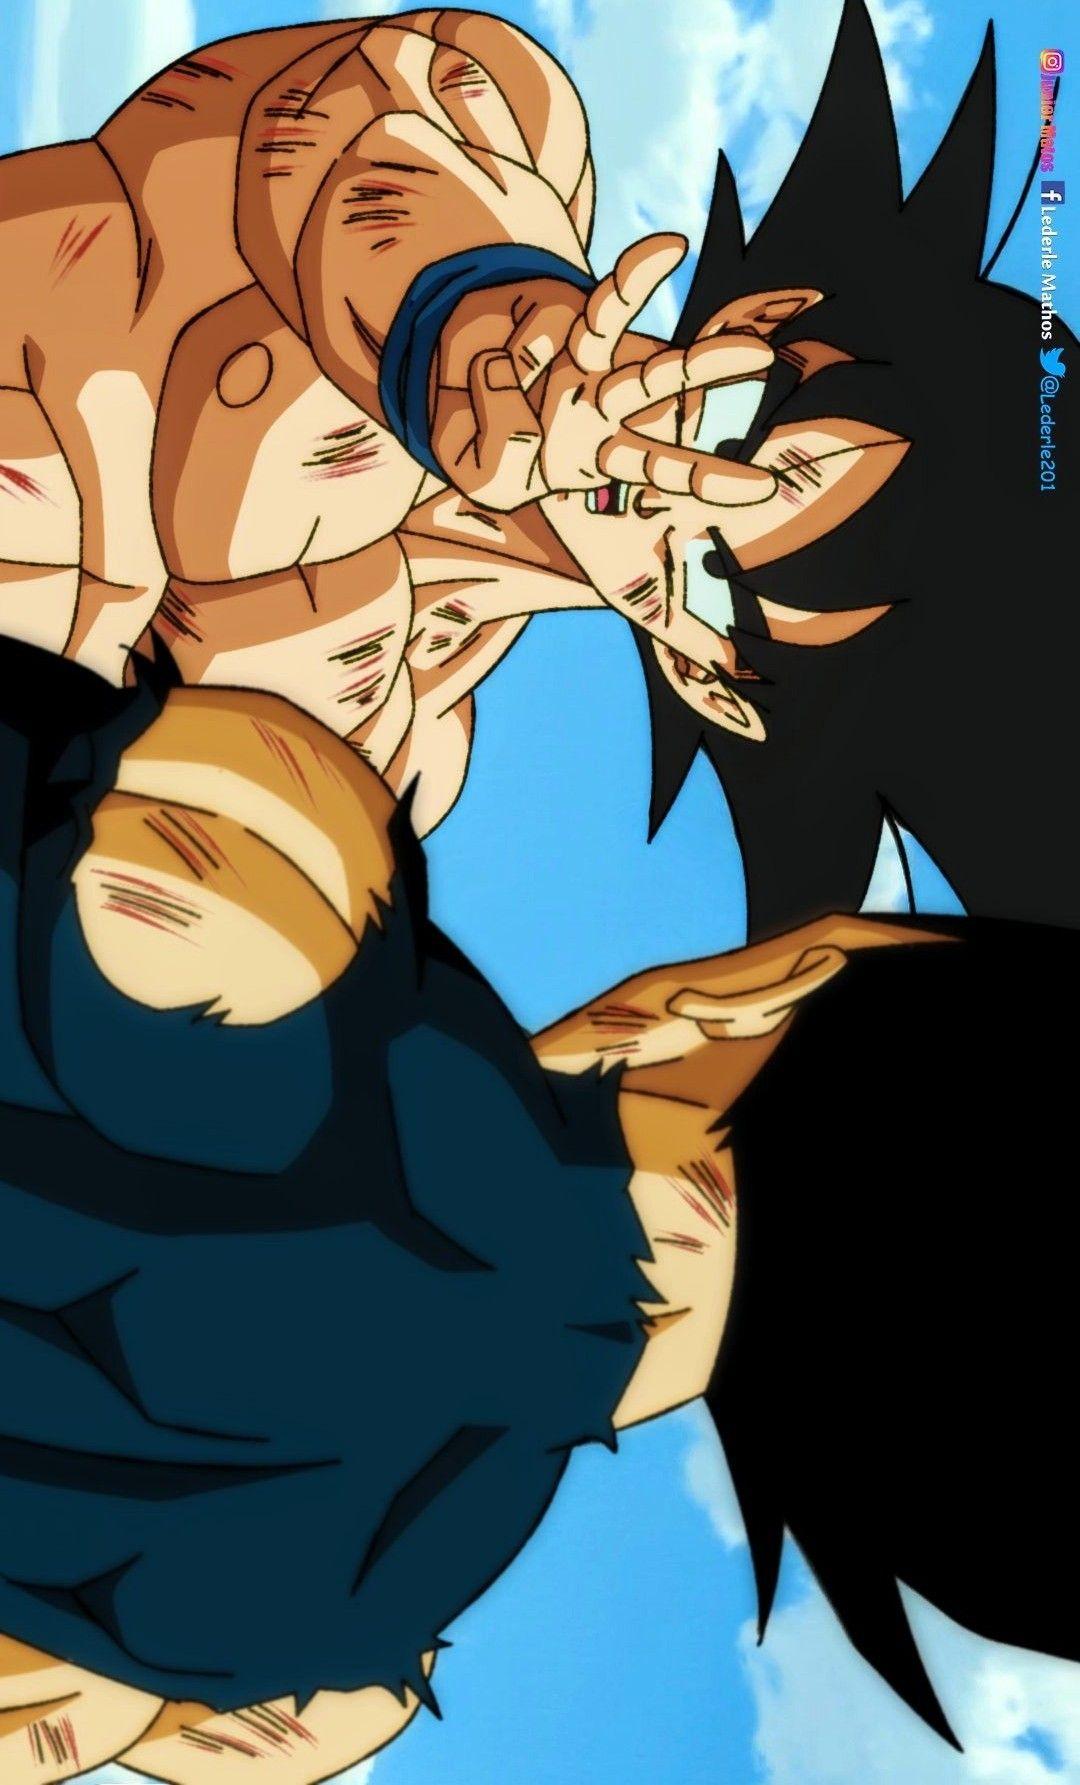 goku vegeta dbsb style dbz by lederle201 anime dragon ball super dragon ball artwork anime dragon ball